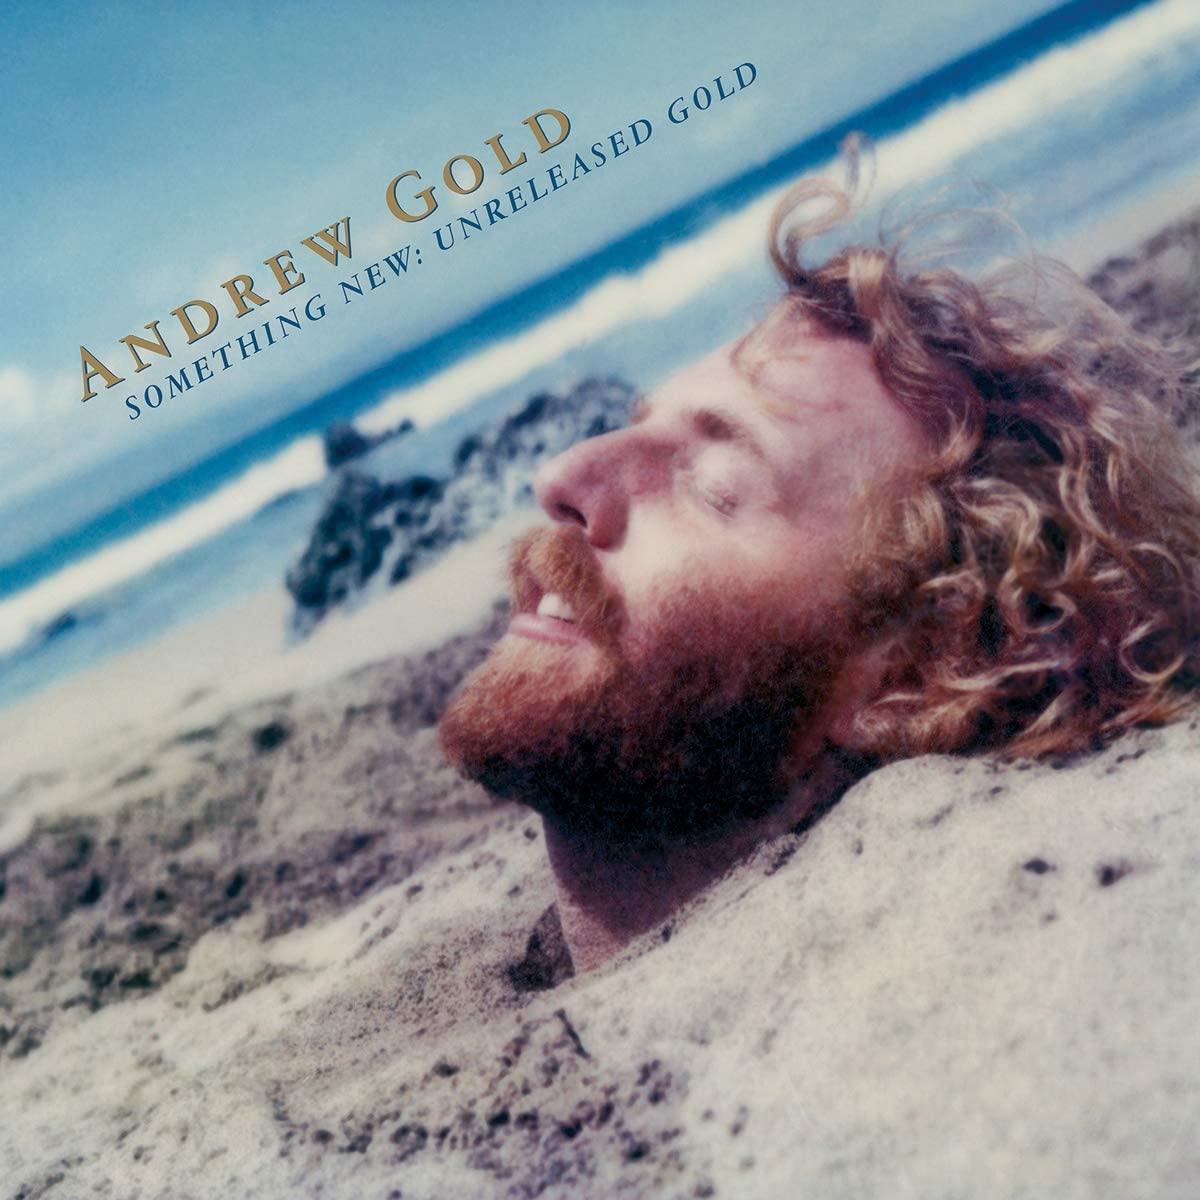 andrew gold_020